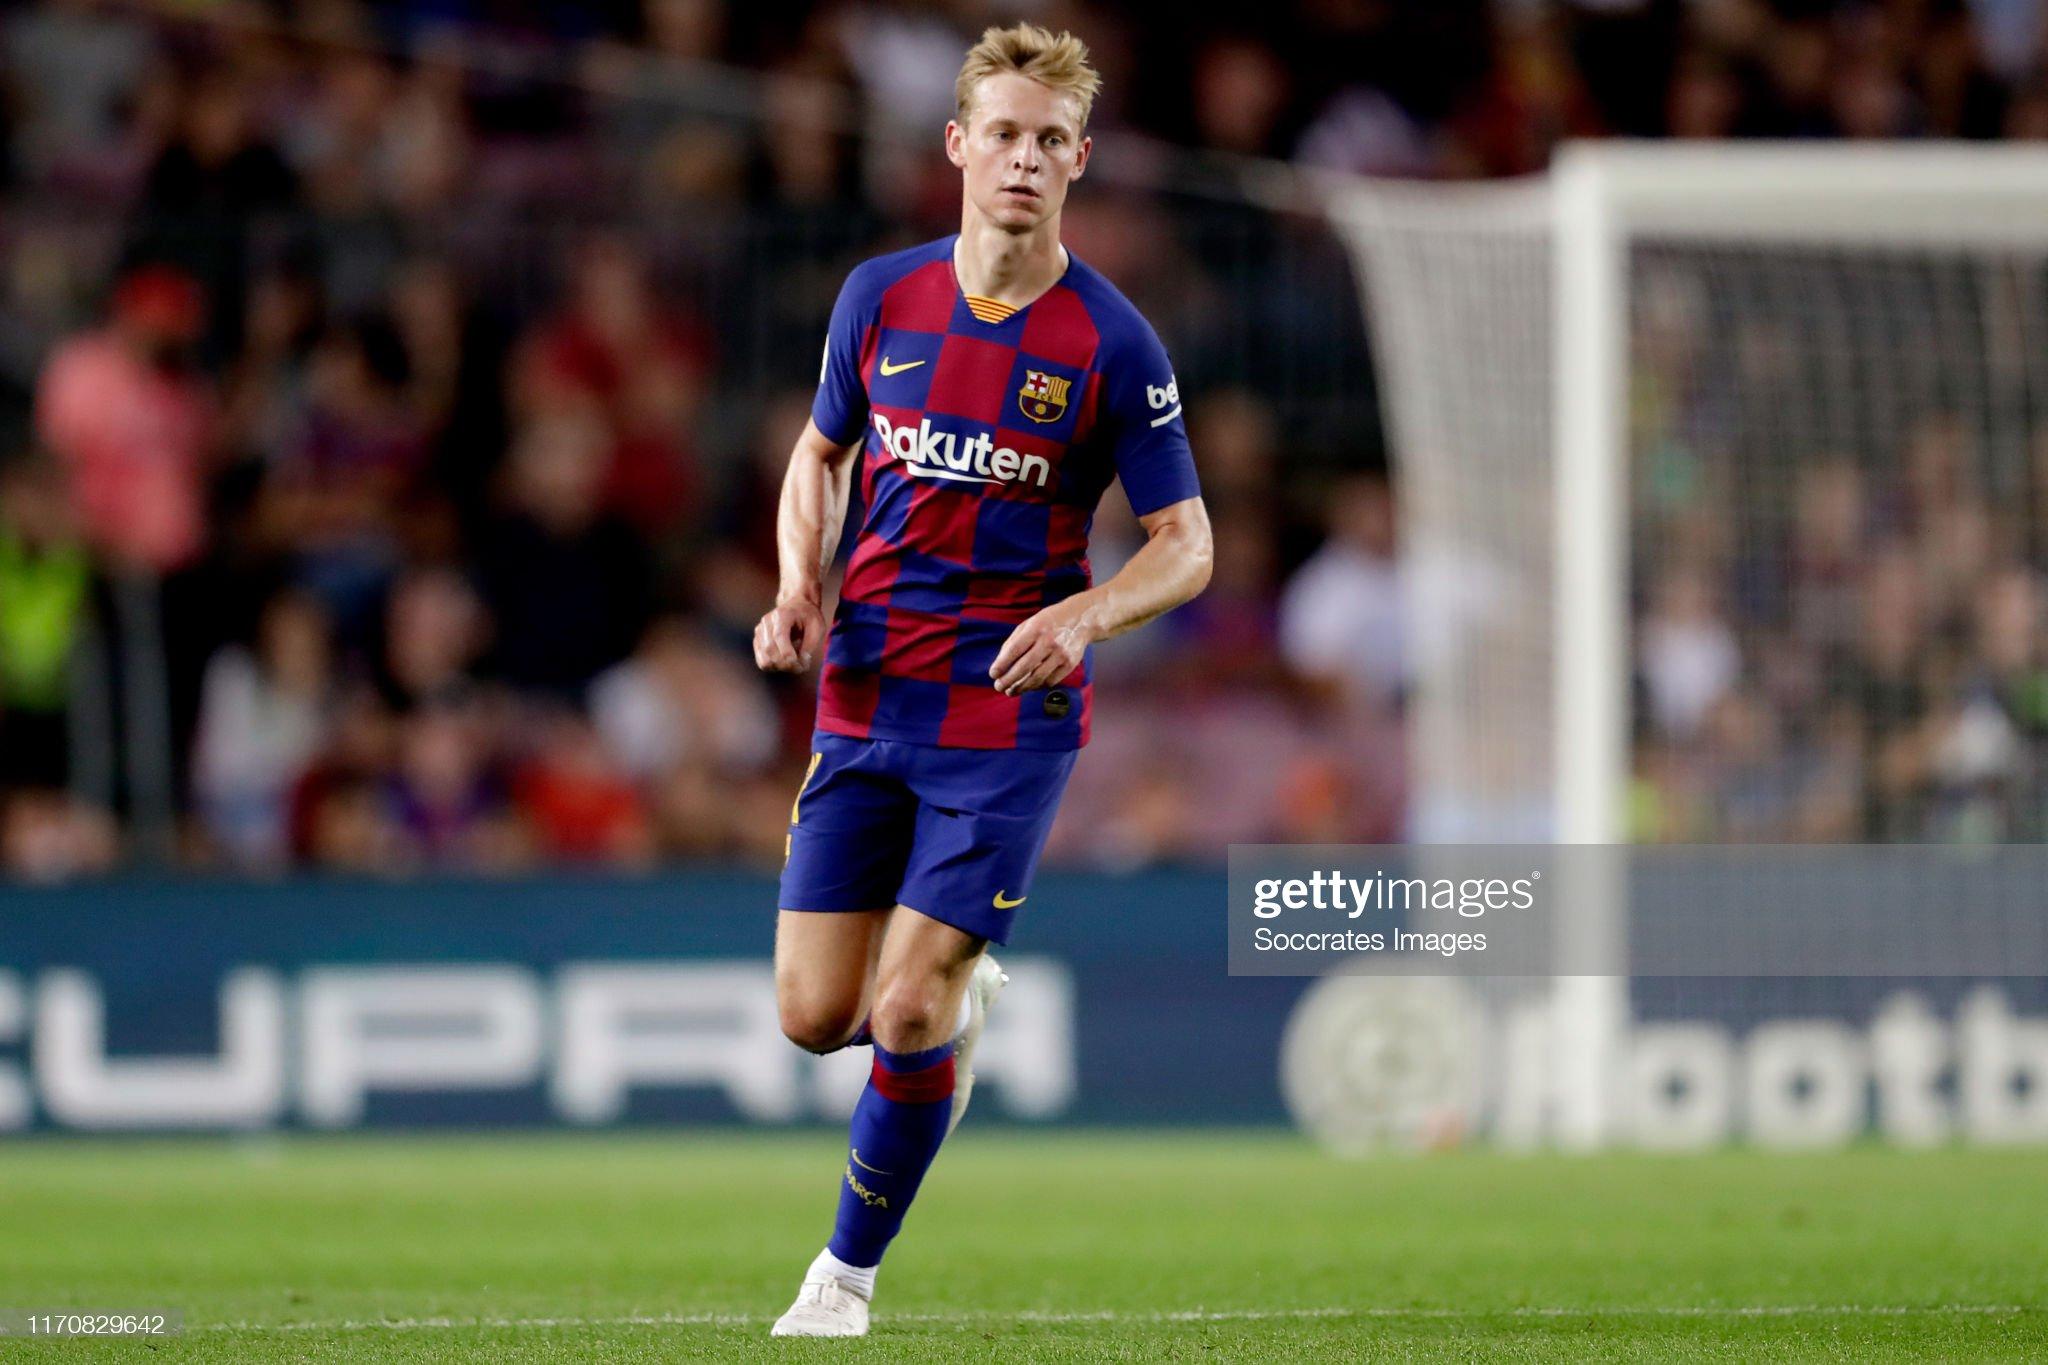 صور مباراة : برشلونة - فياريال 2-1 ( 24-09-2019 )  Frenkie-de-jong-of-fc-barcelona-during-the-la-liga-santander-match-picture-id1170829642?s=2048x2048